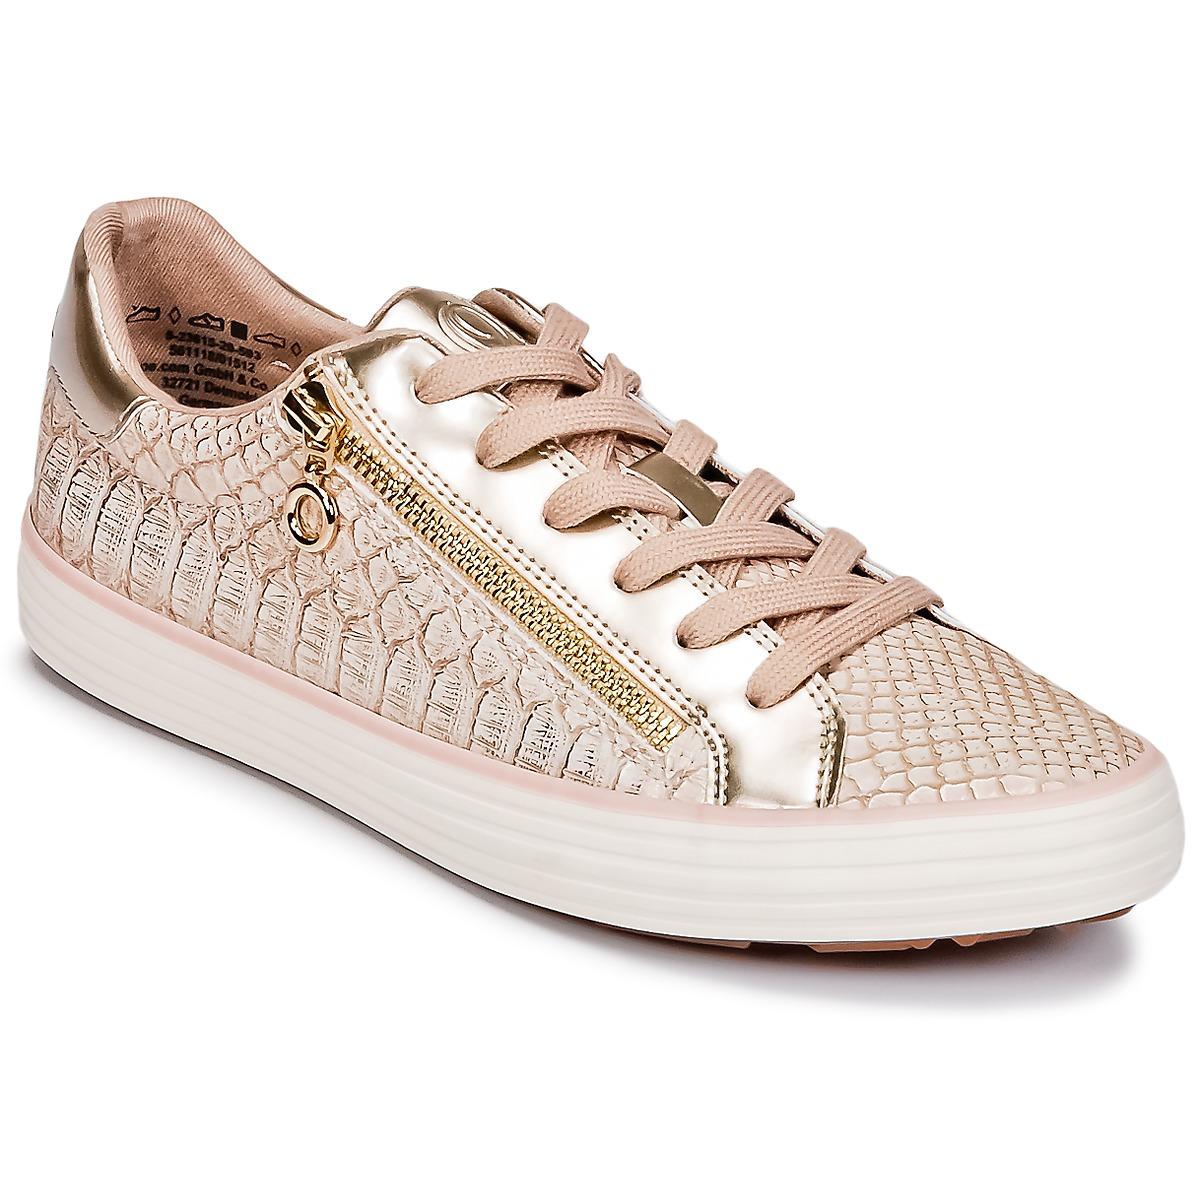 SOliver BOOMBO Rose / Gold - Kostenloser Versand bei Spartoode ! - Schuhe Sneaker Low Damen 48,00 €